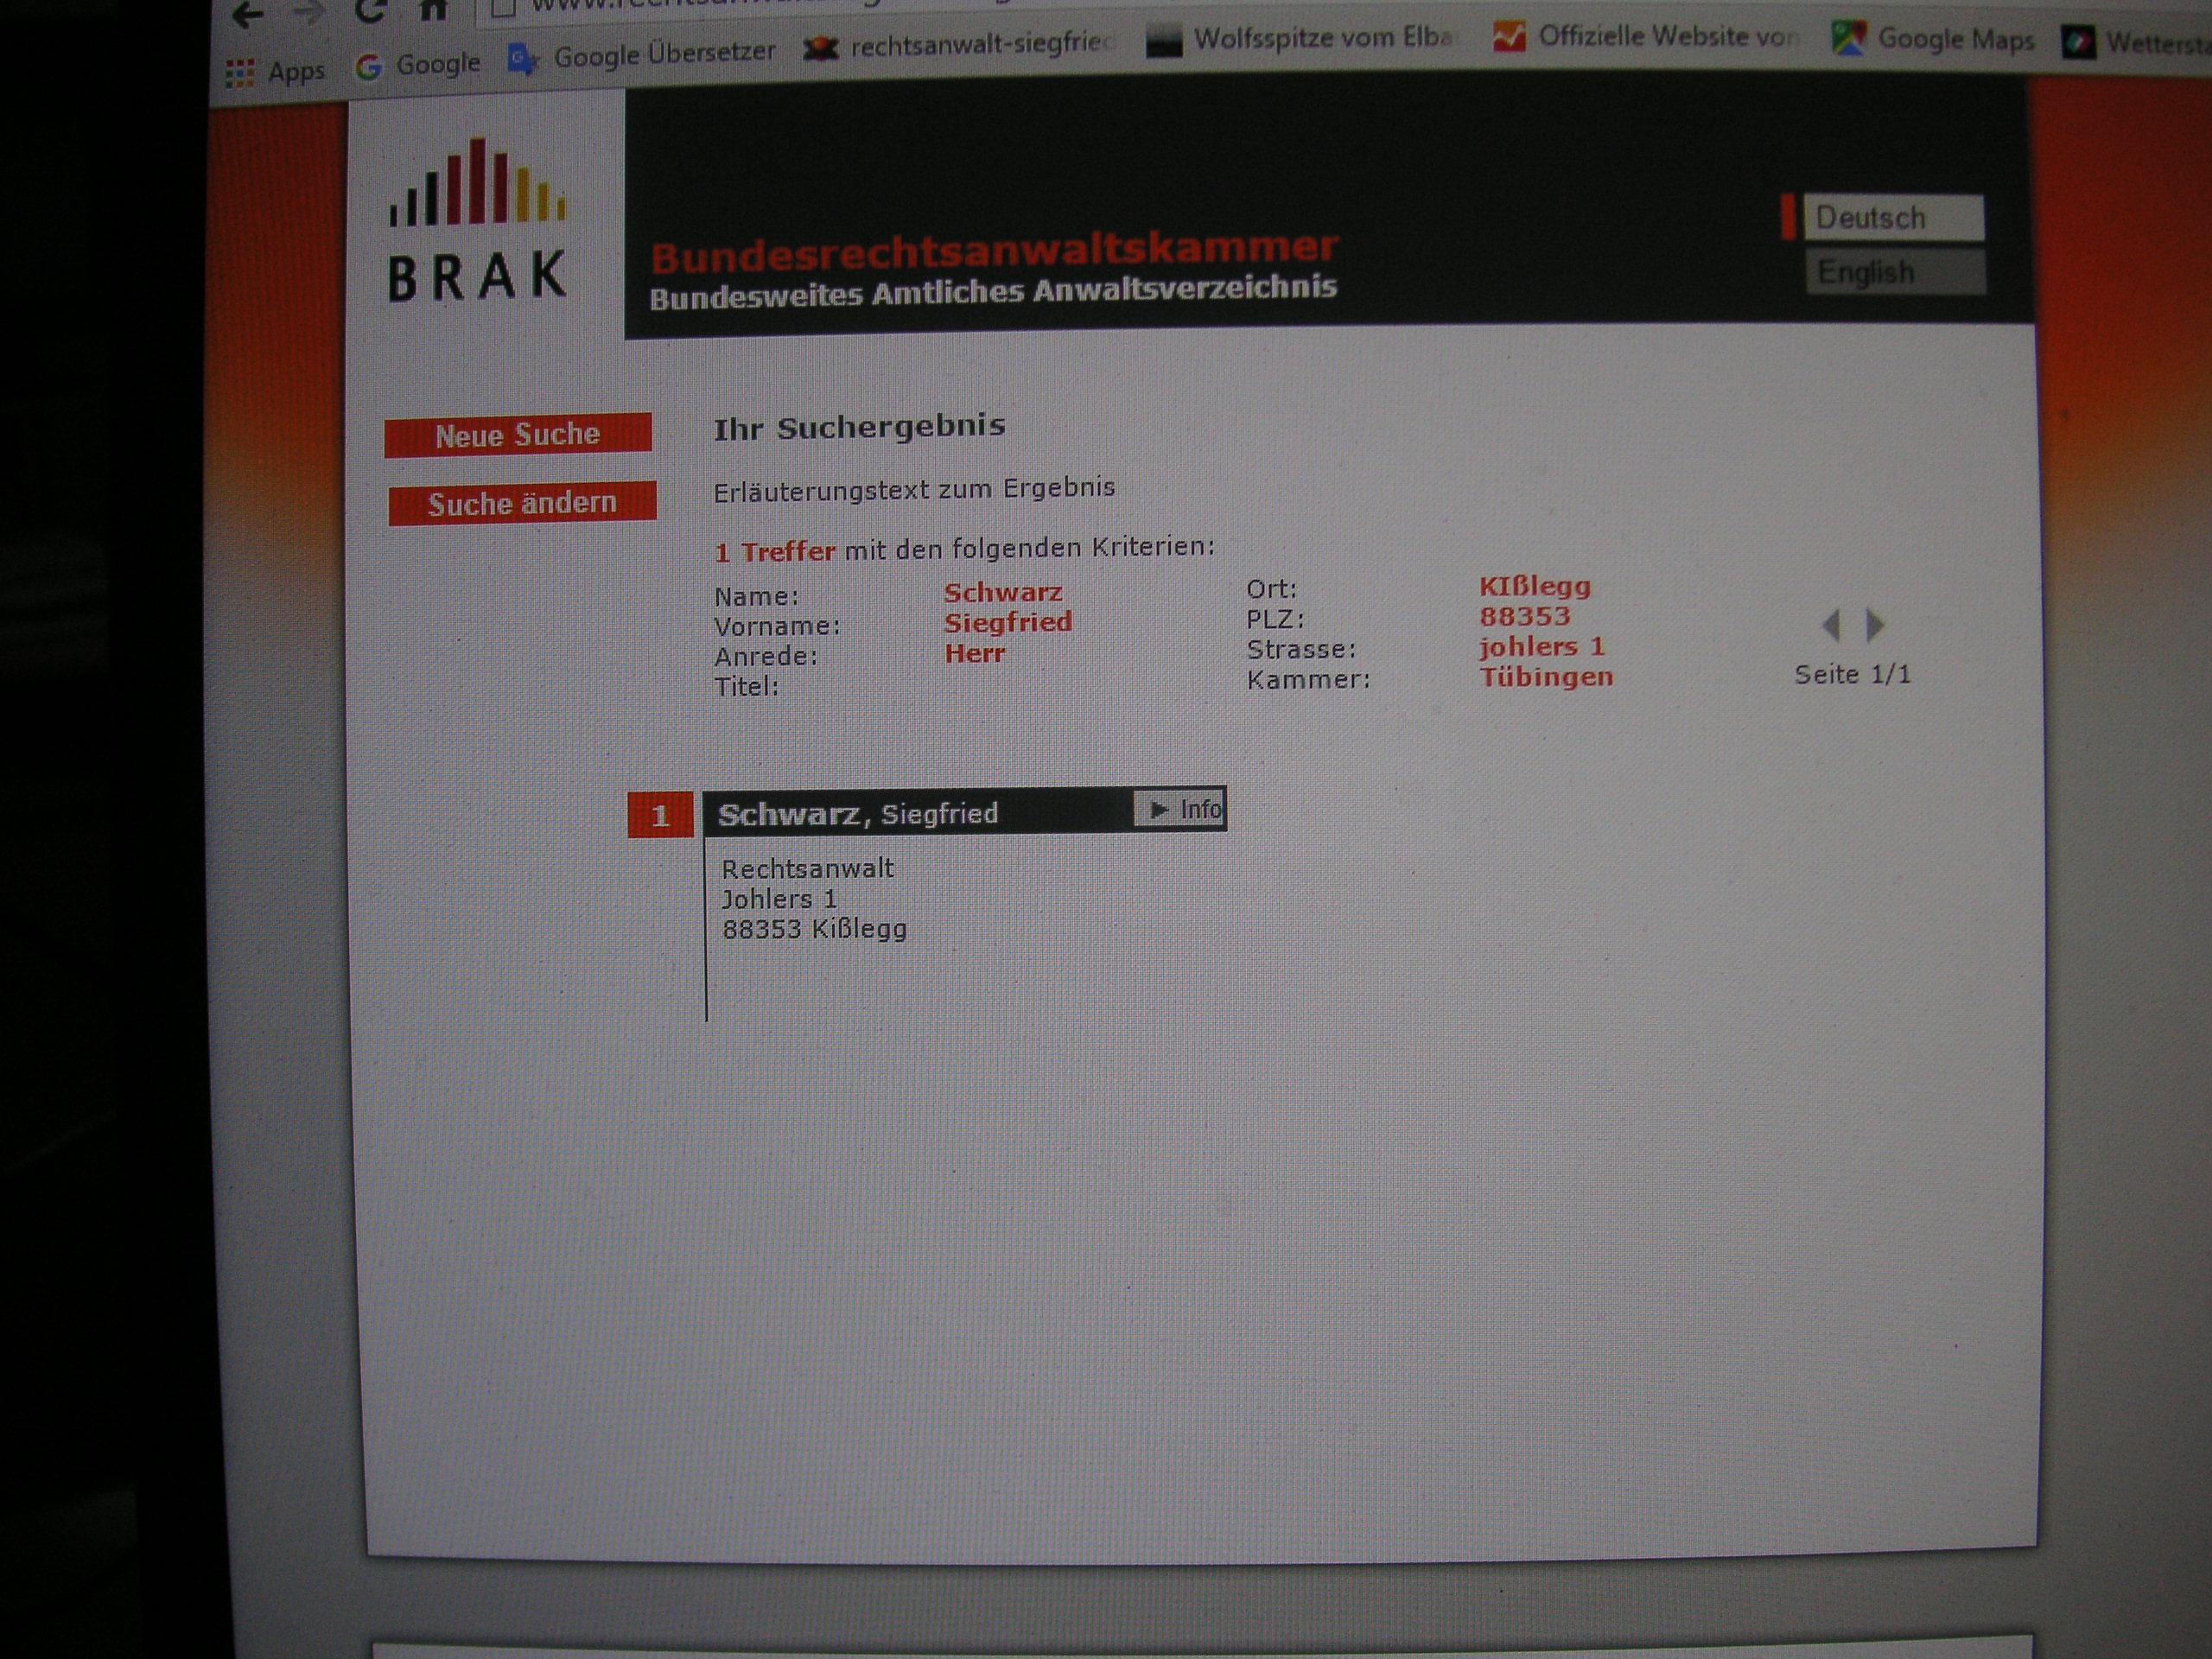 Kontakt Infos Impressum Rechtsanwalt Siegfried M Schwarz